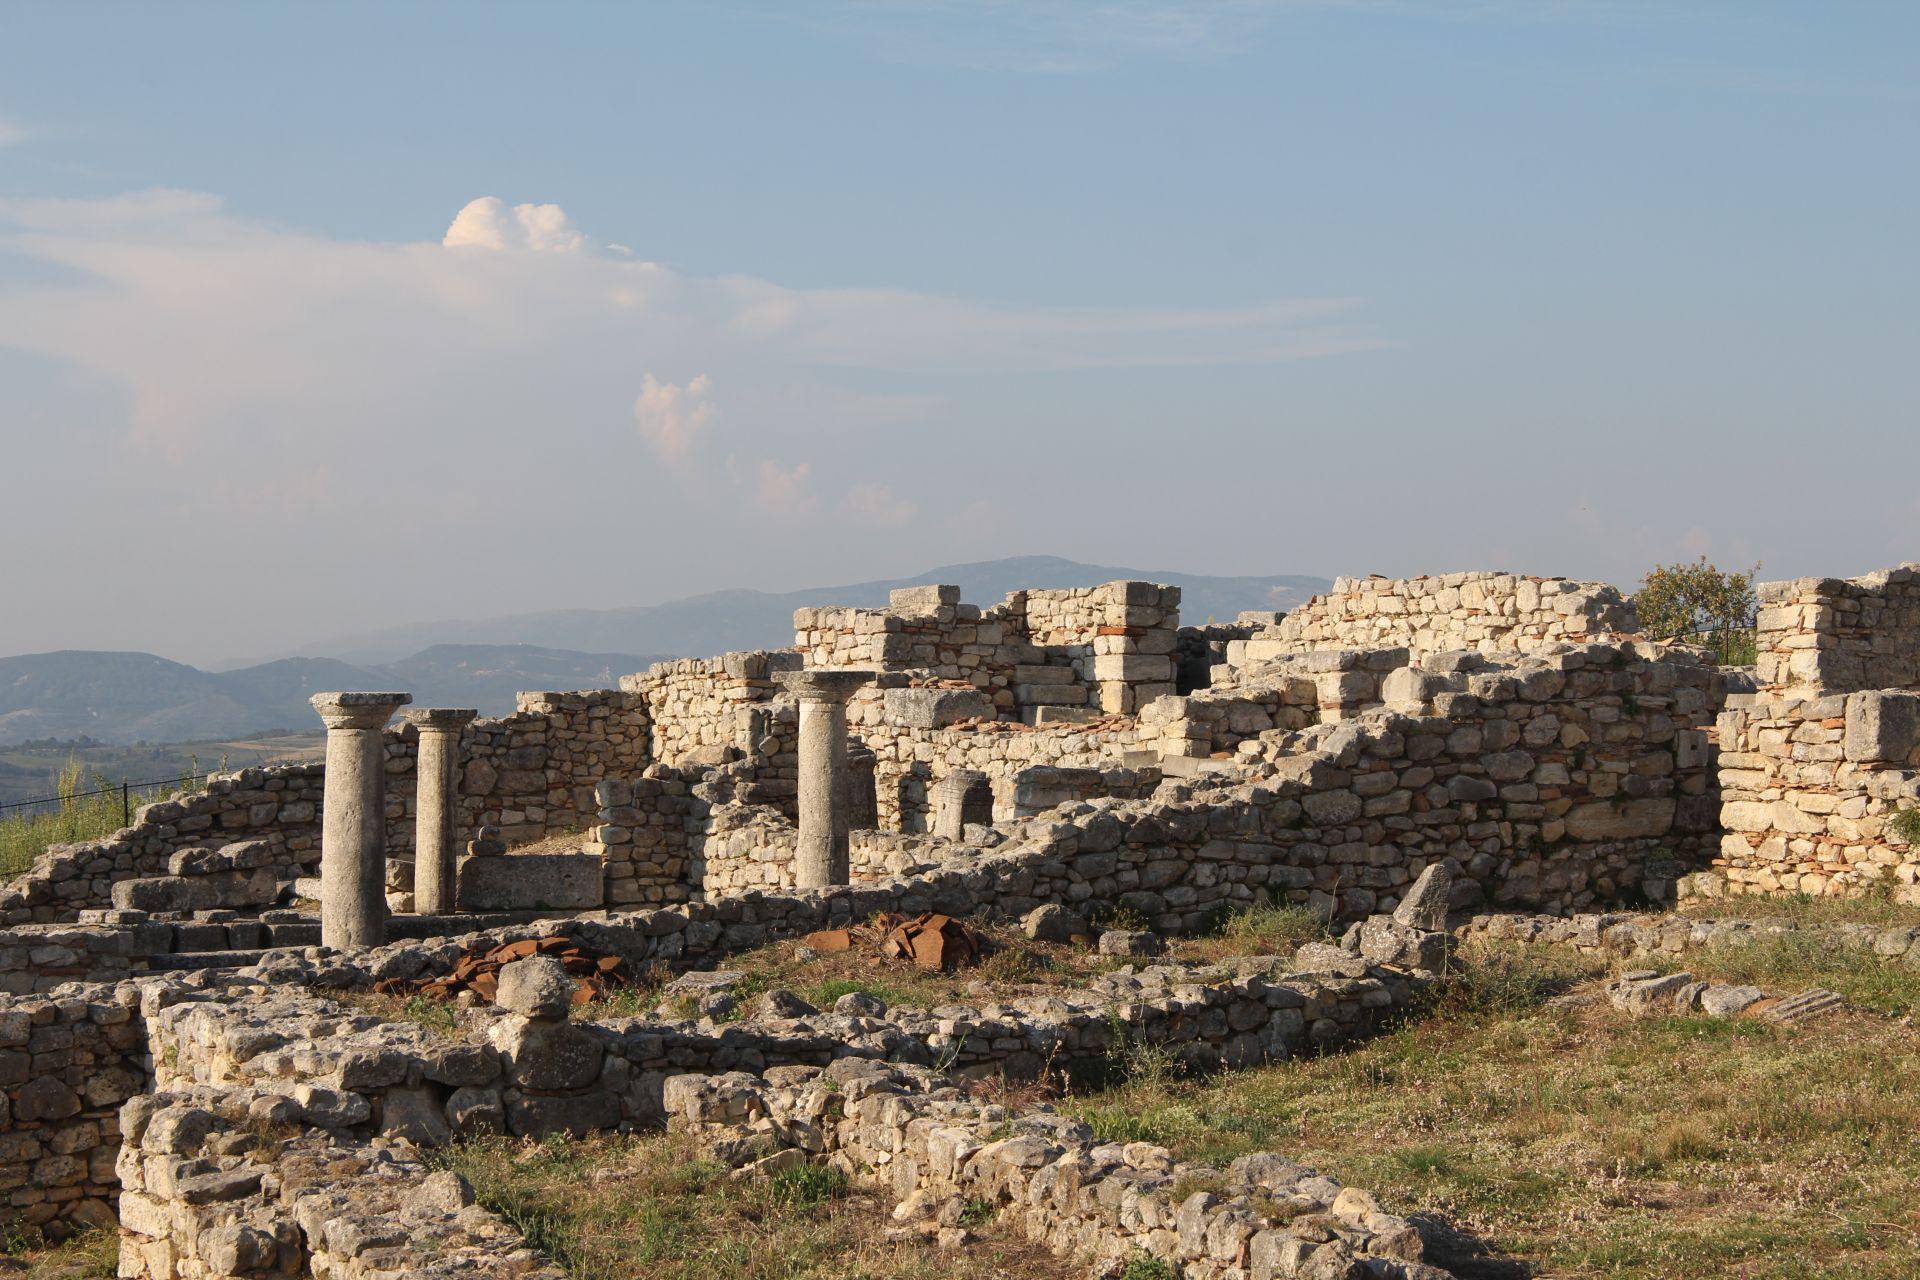 Parco archeologico di Byllis - Guida archeologica dell'Albania